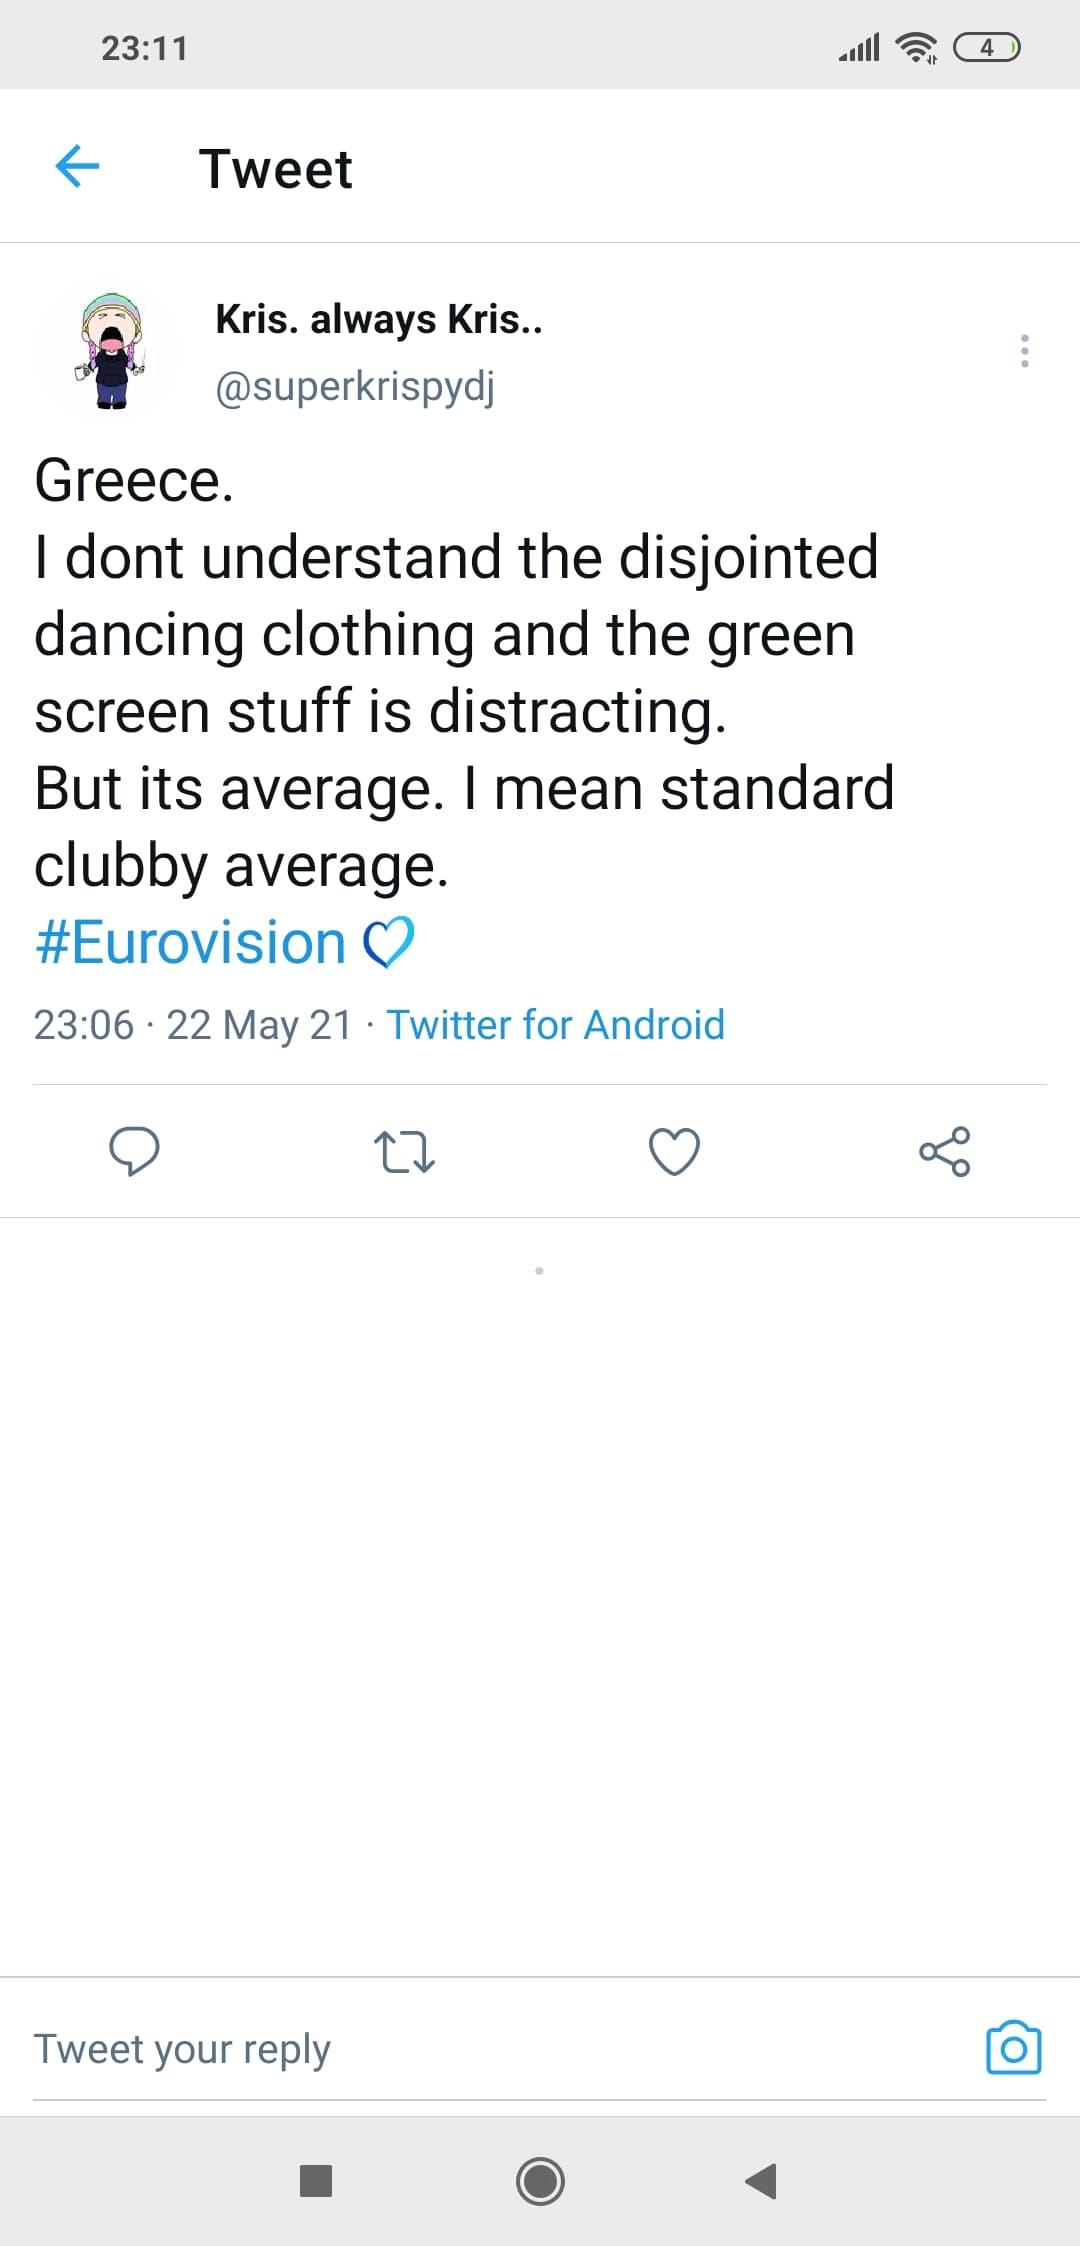 Eurovision Ελλάδα: Λάθος Όλα στην εμφάνιση της Στεφανίας - Φάνηκε και αυτός που κράταγε την εκπρόσωπο της Ελλάδας στο γκριν μποξ